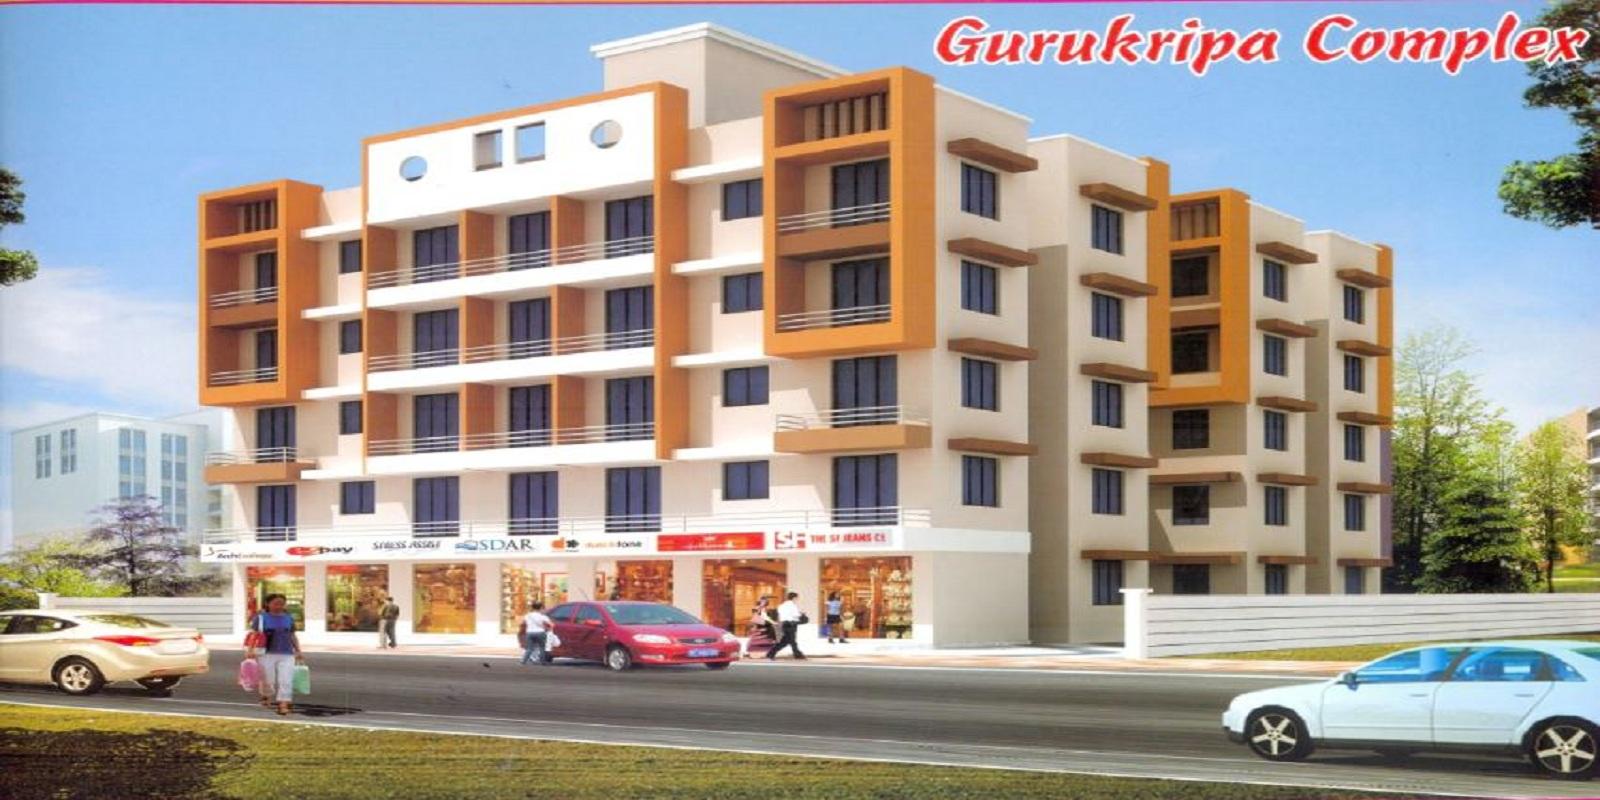 s s guru kripa complex project large image2